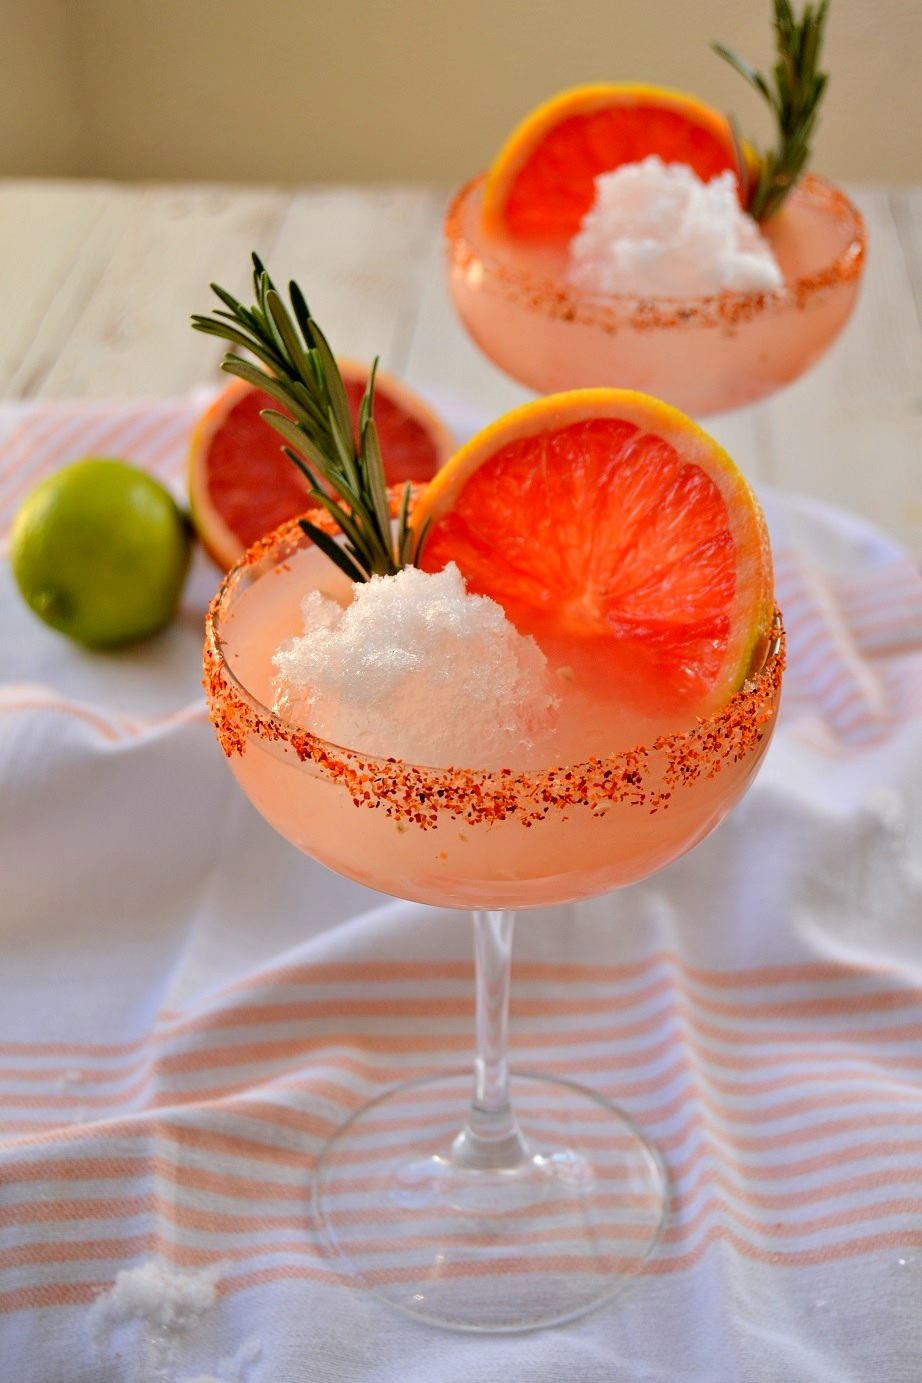 Fair Robin Revival - Rosemary Grapefruit Snowball Margarita